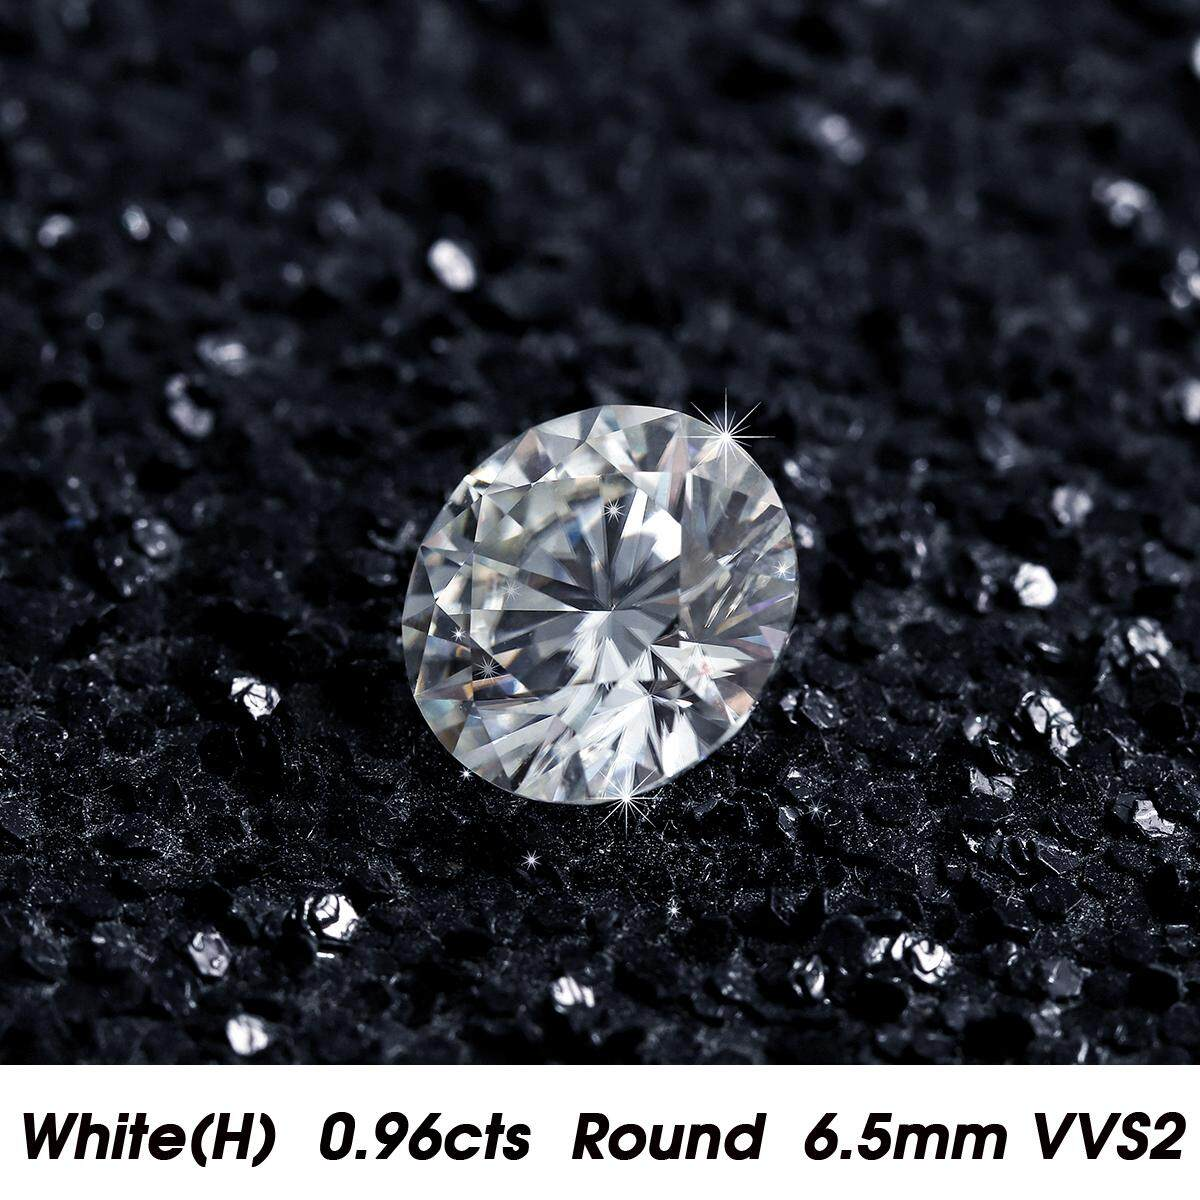 Berlian Putih H Warna 0.96cts 6.5 Mm Round Bentuk Vvs2 Kejelasan Longgar Bersertifikat Moissanite By Wings Wind.